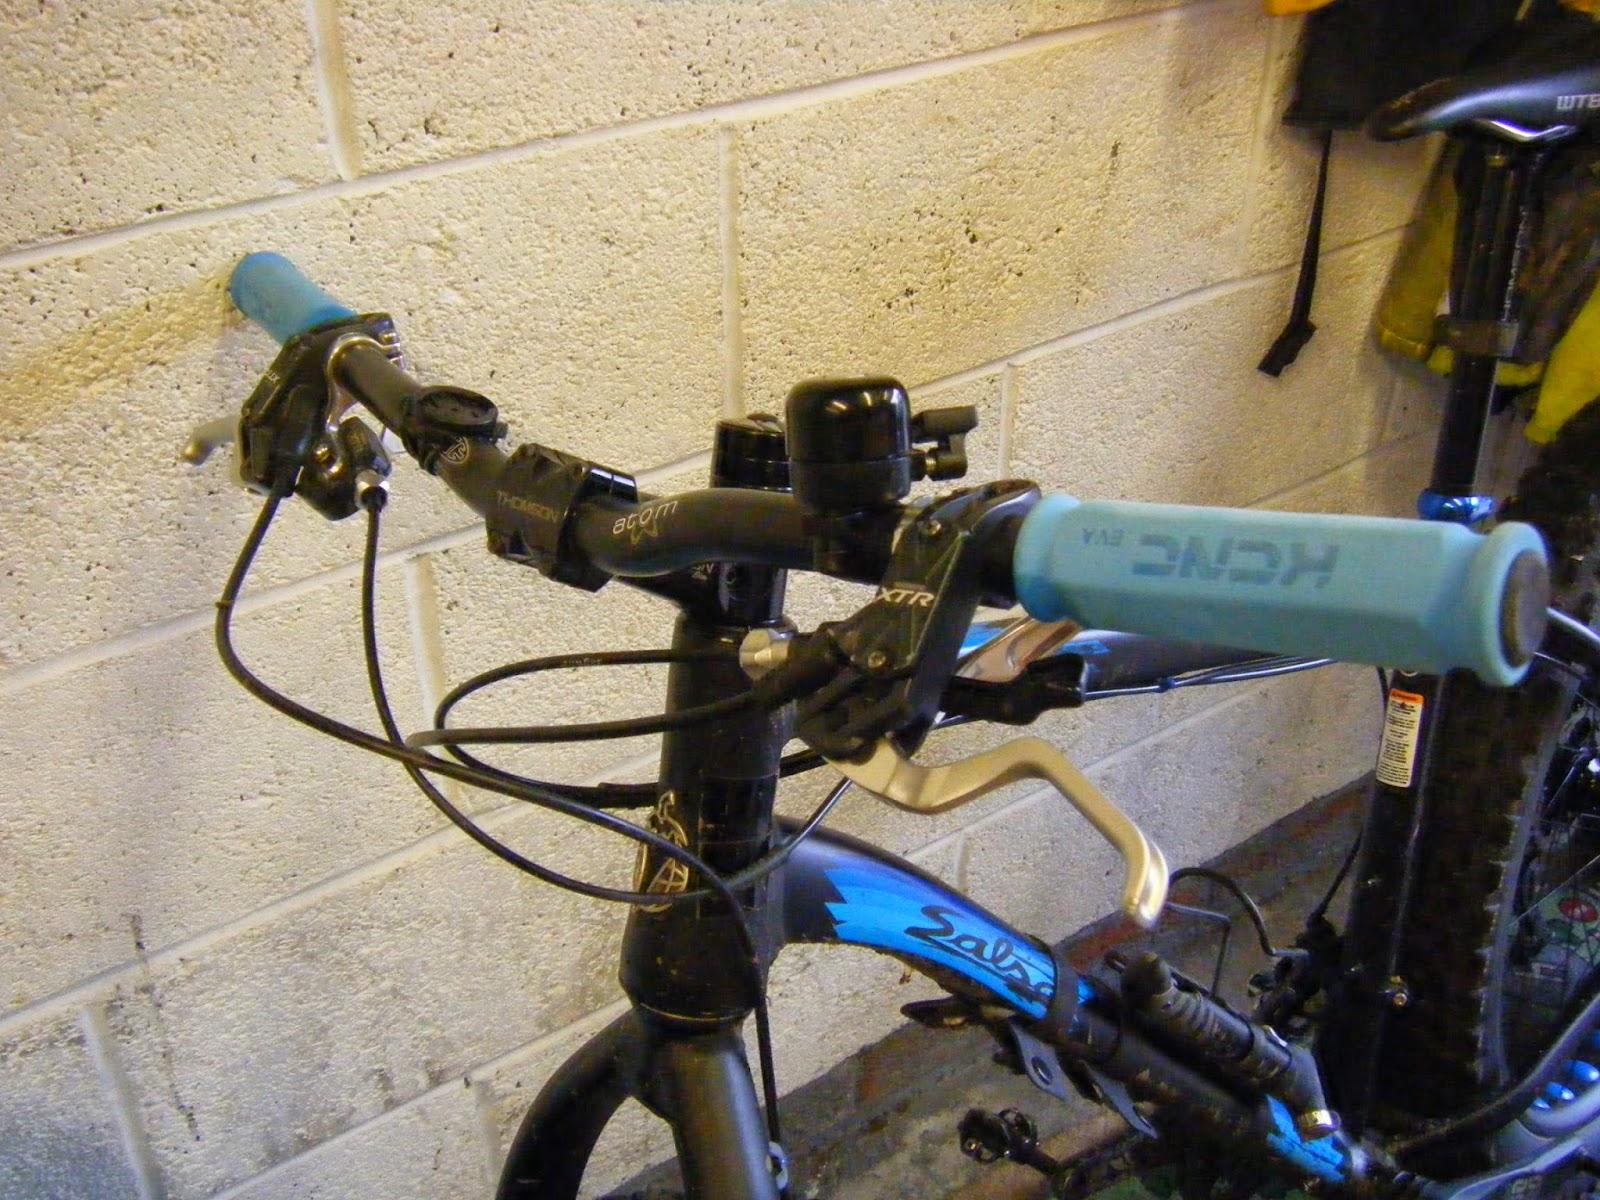 KCNC EVA Foam MTB Mountain Bike Bicycle Cycling Handlebar Bar Grips Black